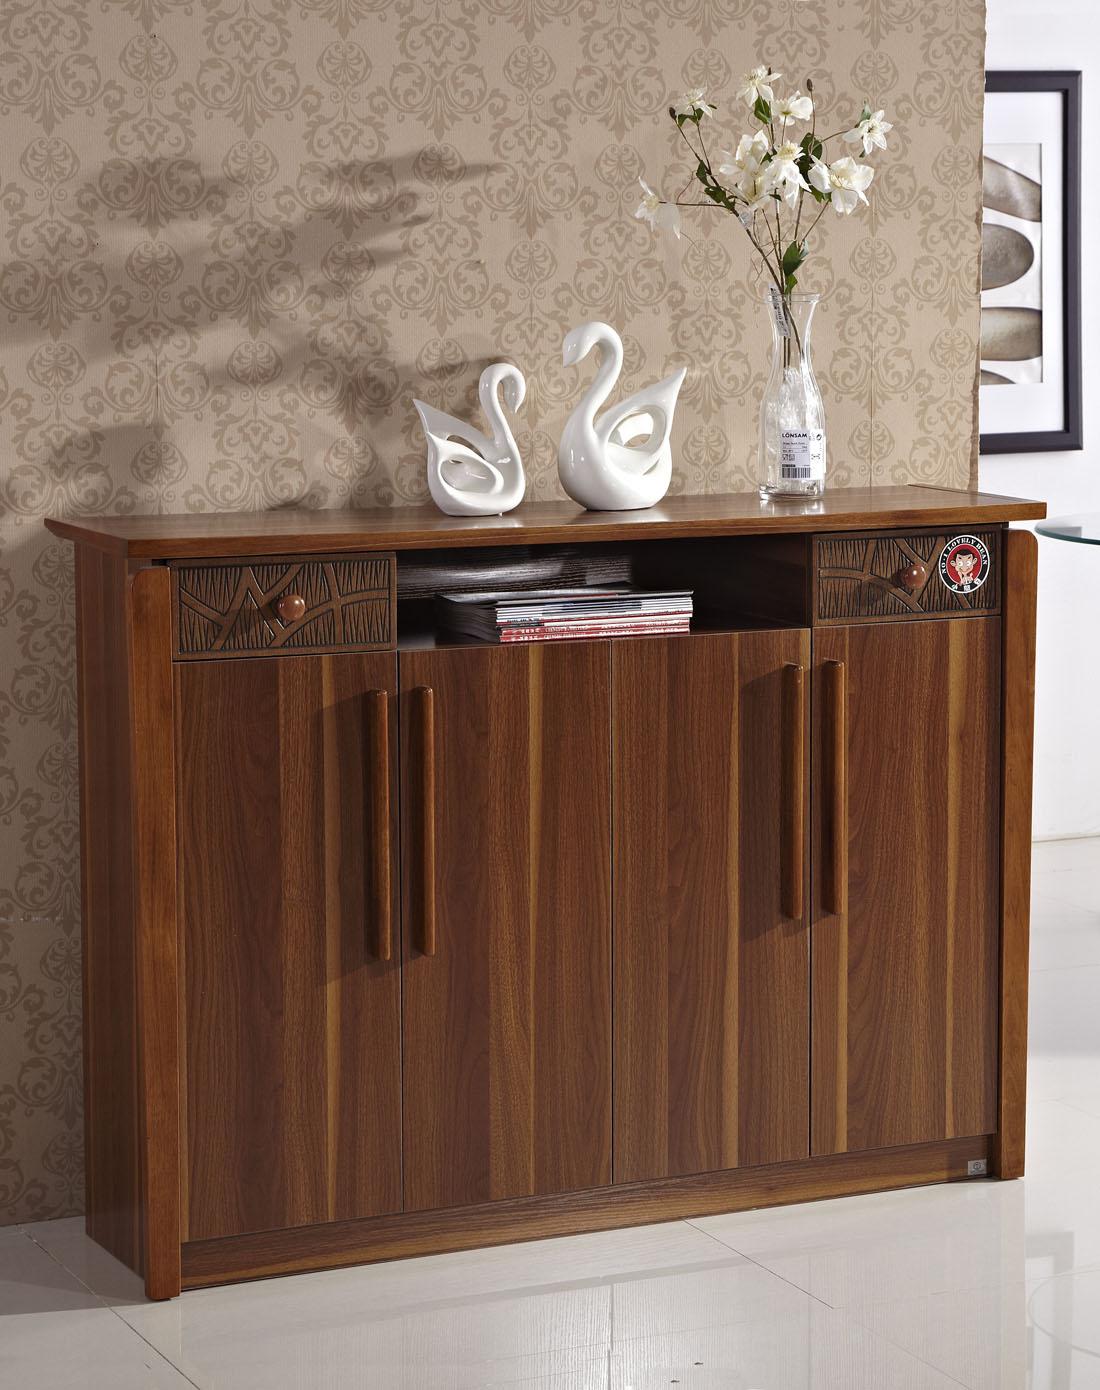 homes家具中式木纹四门大容量鞋柜xhd